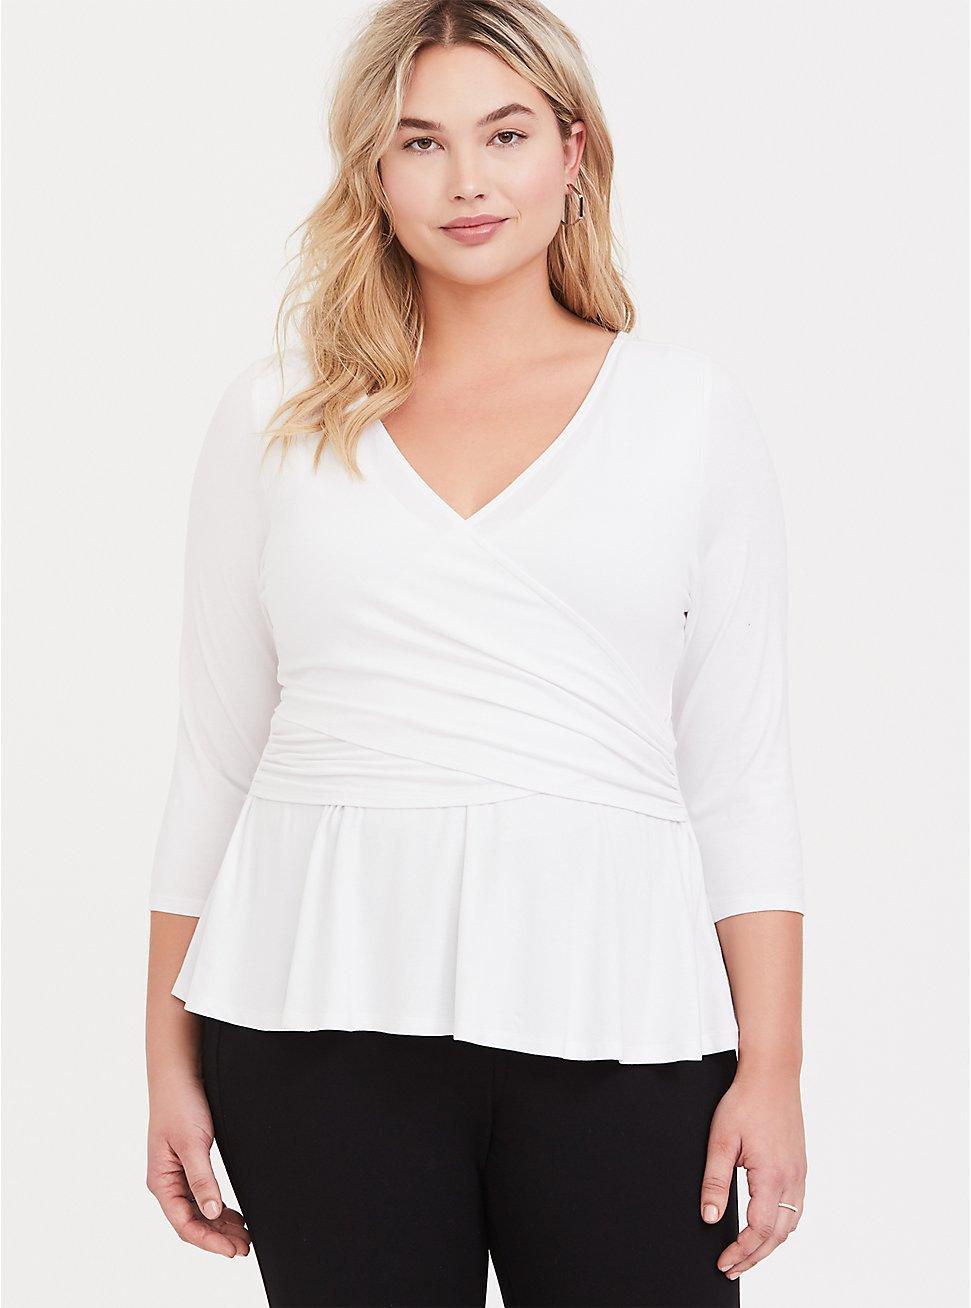 Super Soft White Surplice Peplum Top, WHITE, hi-res